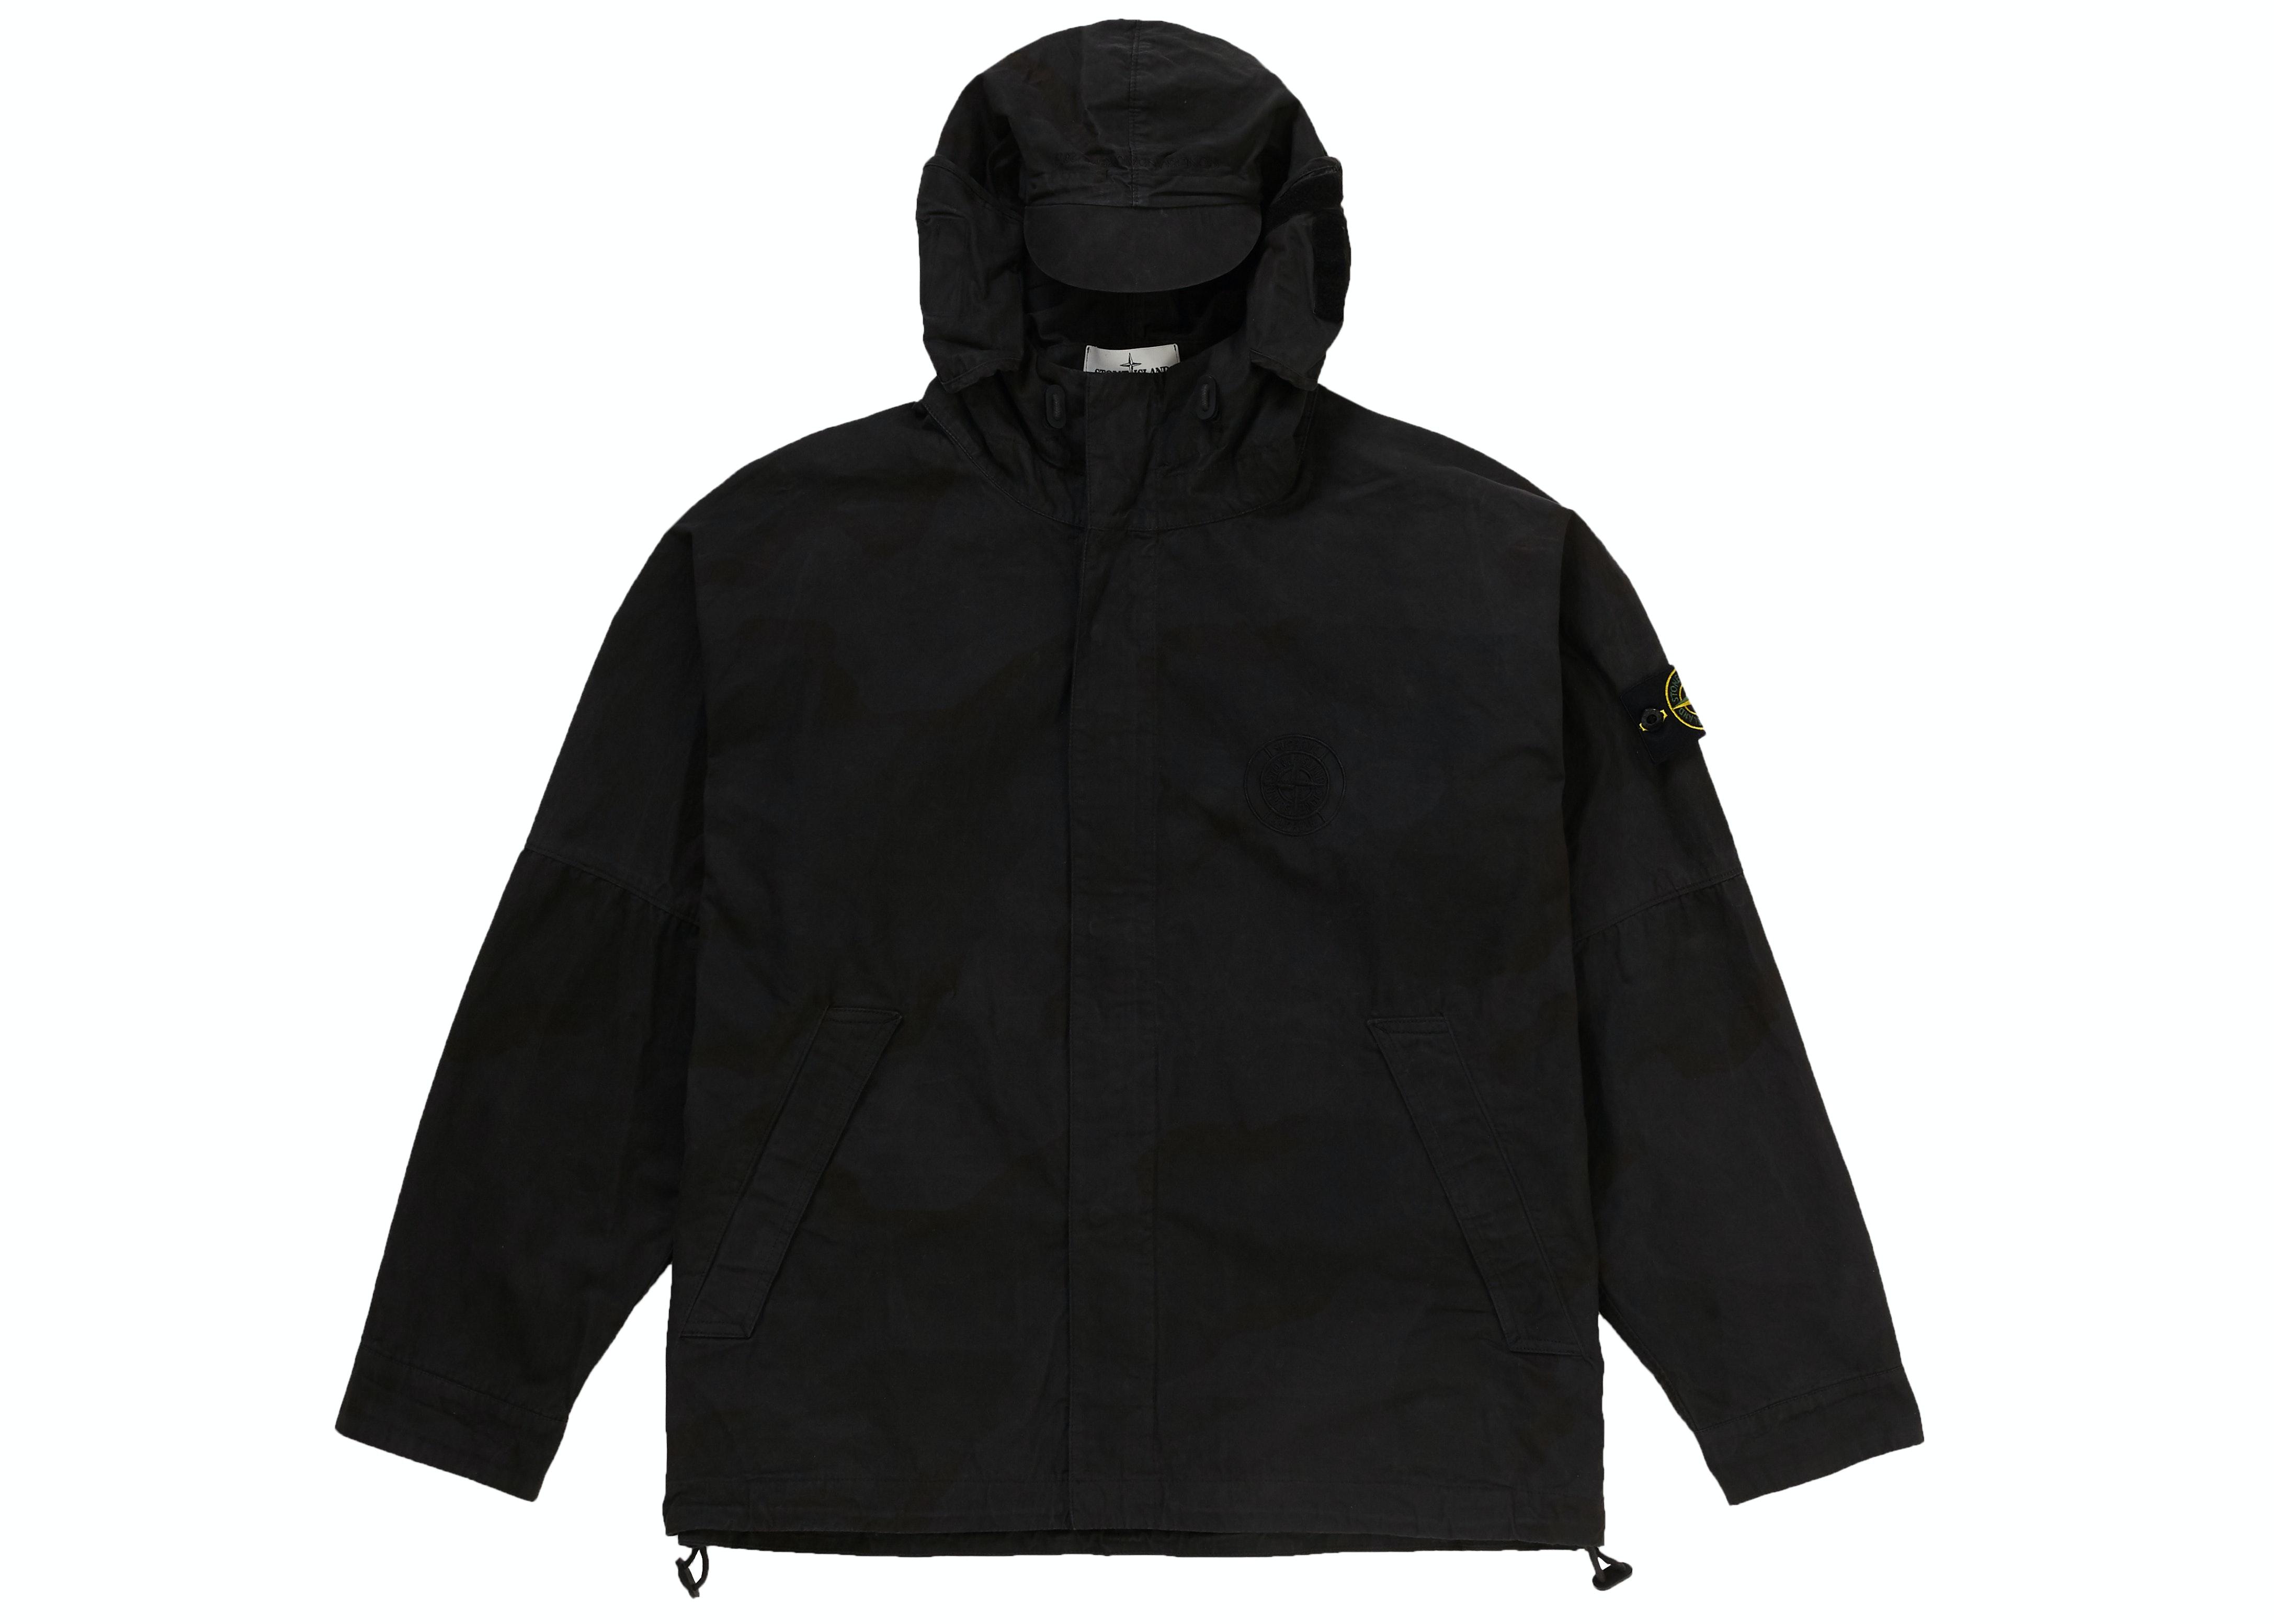 Supreme Stone Island Riot Mask Camo Jacket Black Camo